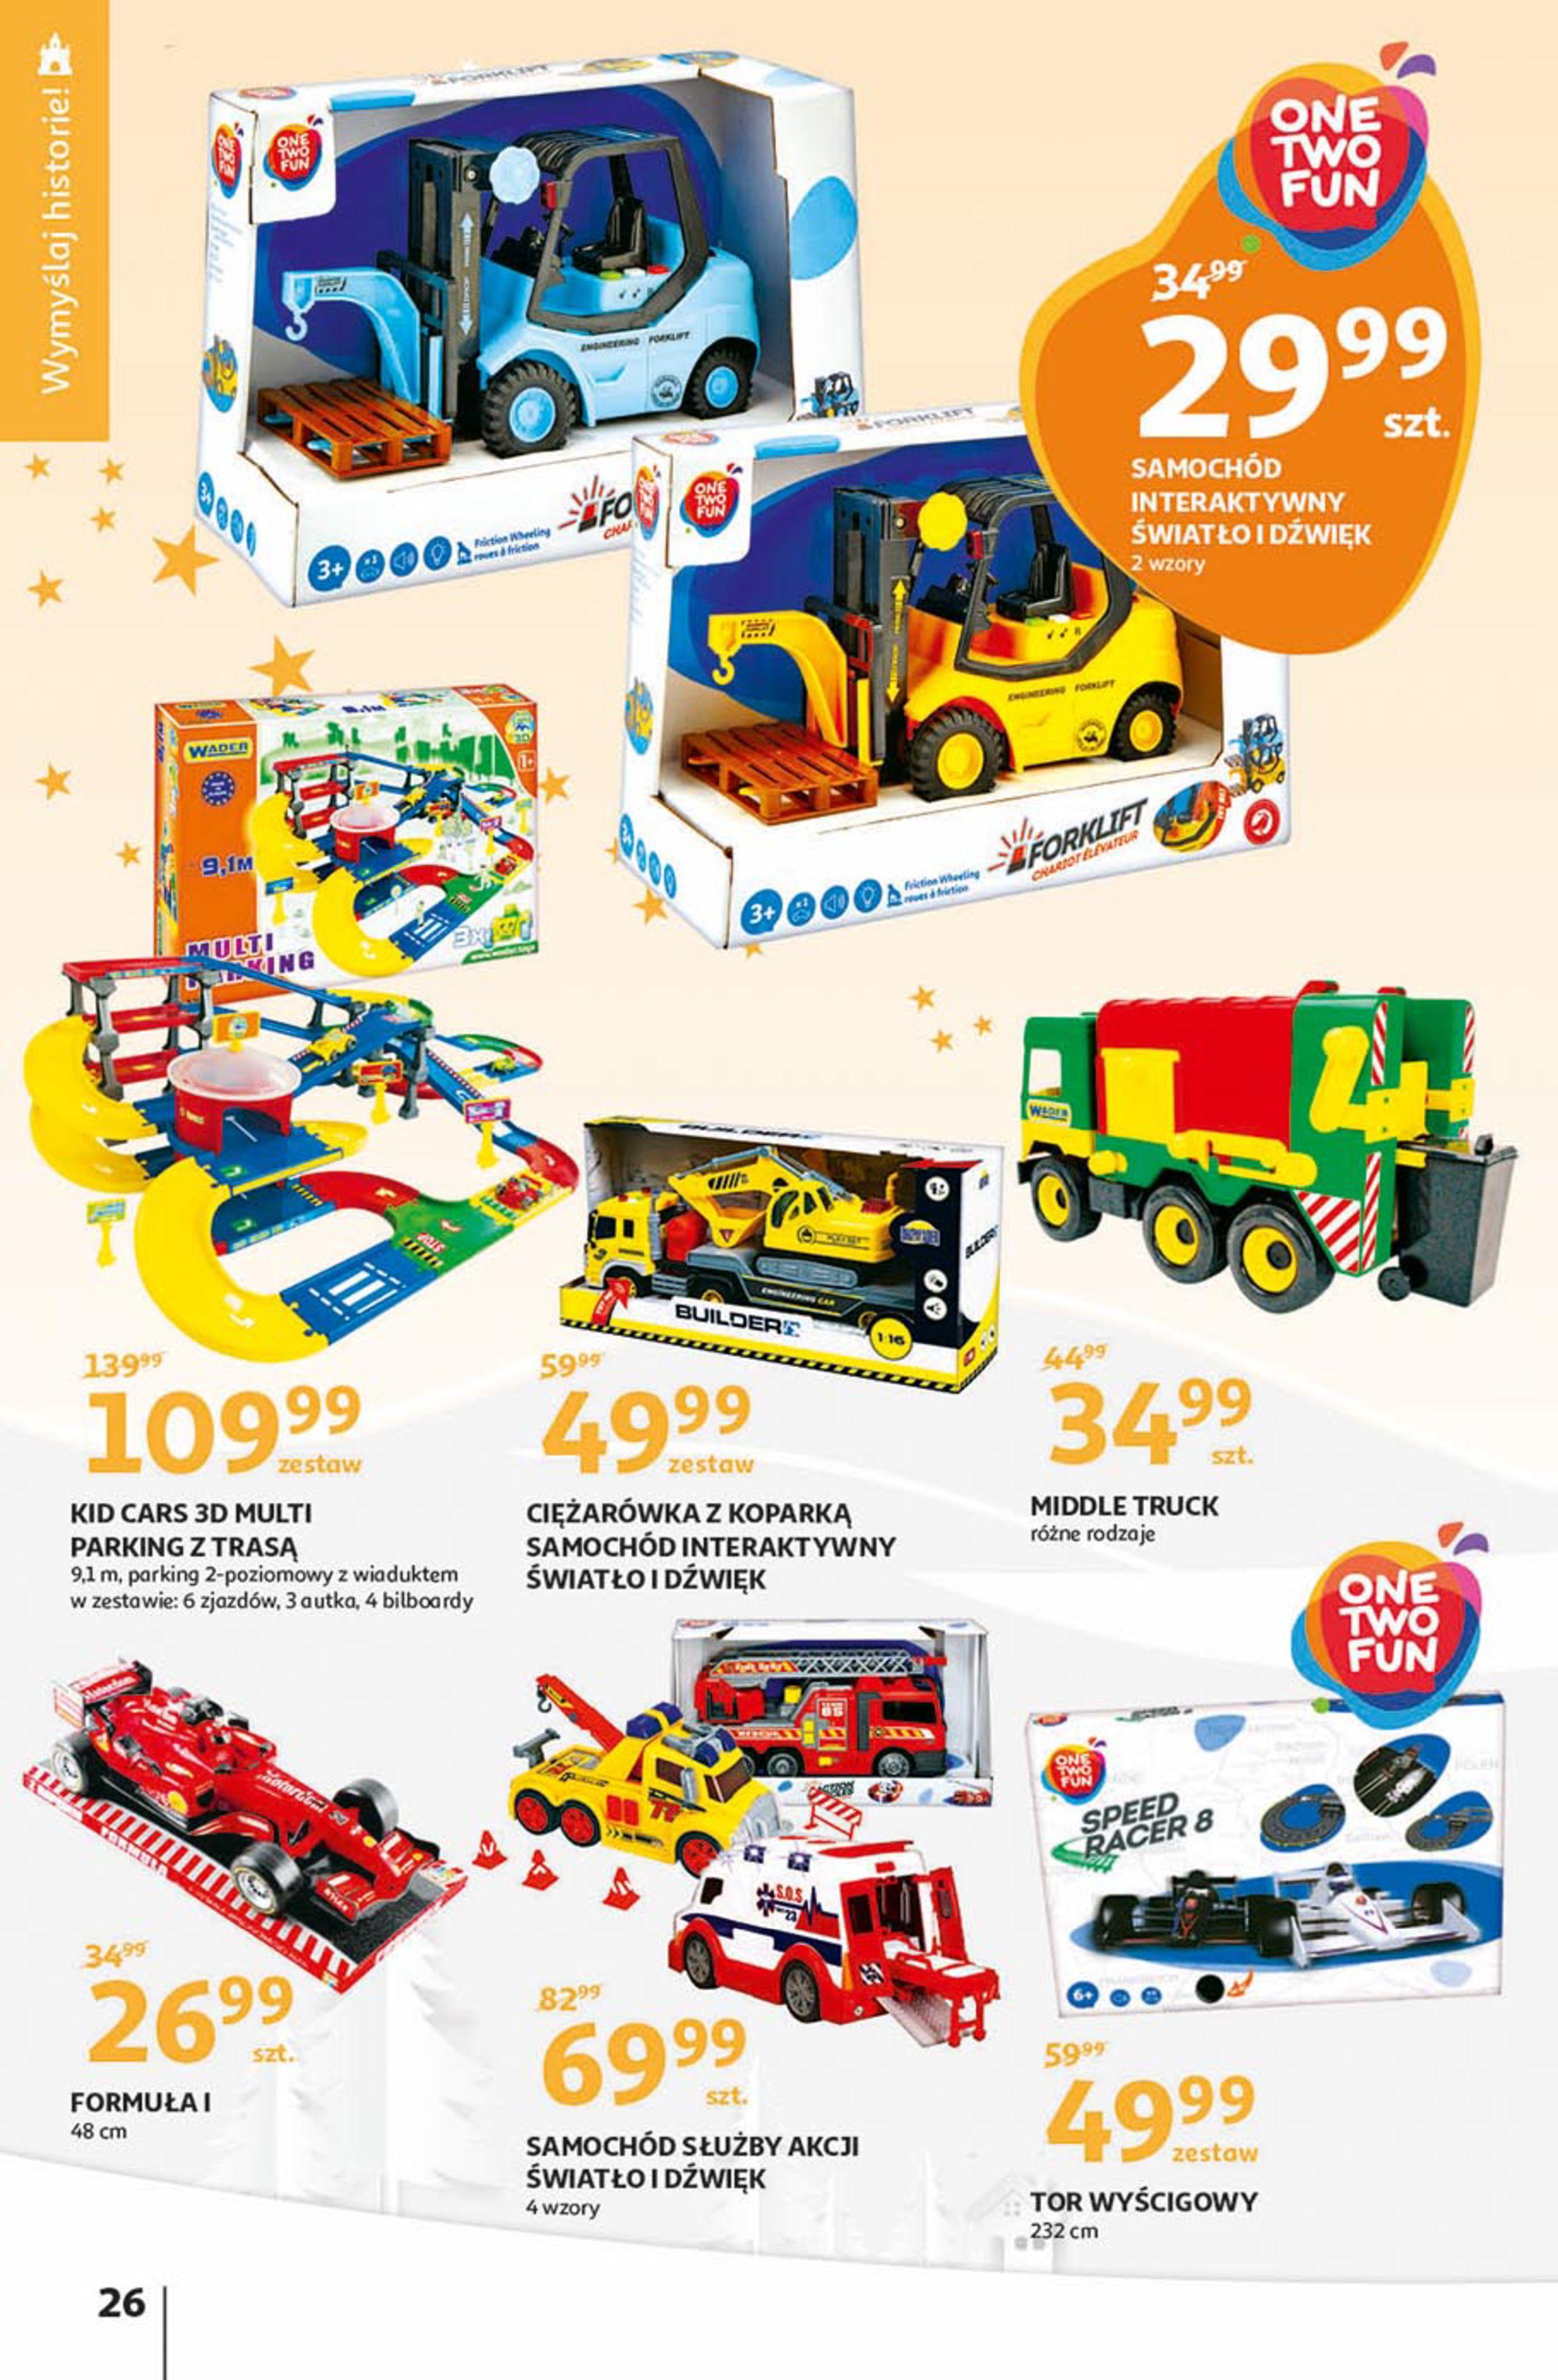 Gazetka Auchan - Magia zabawek Hipermarkety-06.11.2019-20.11.2019-page-26